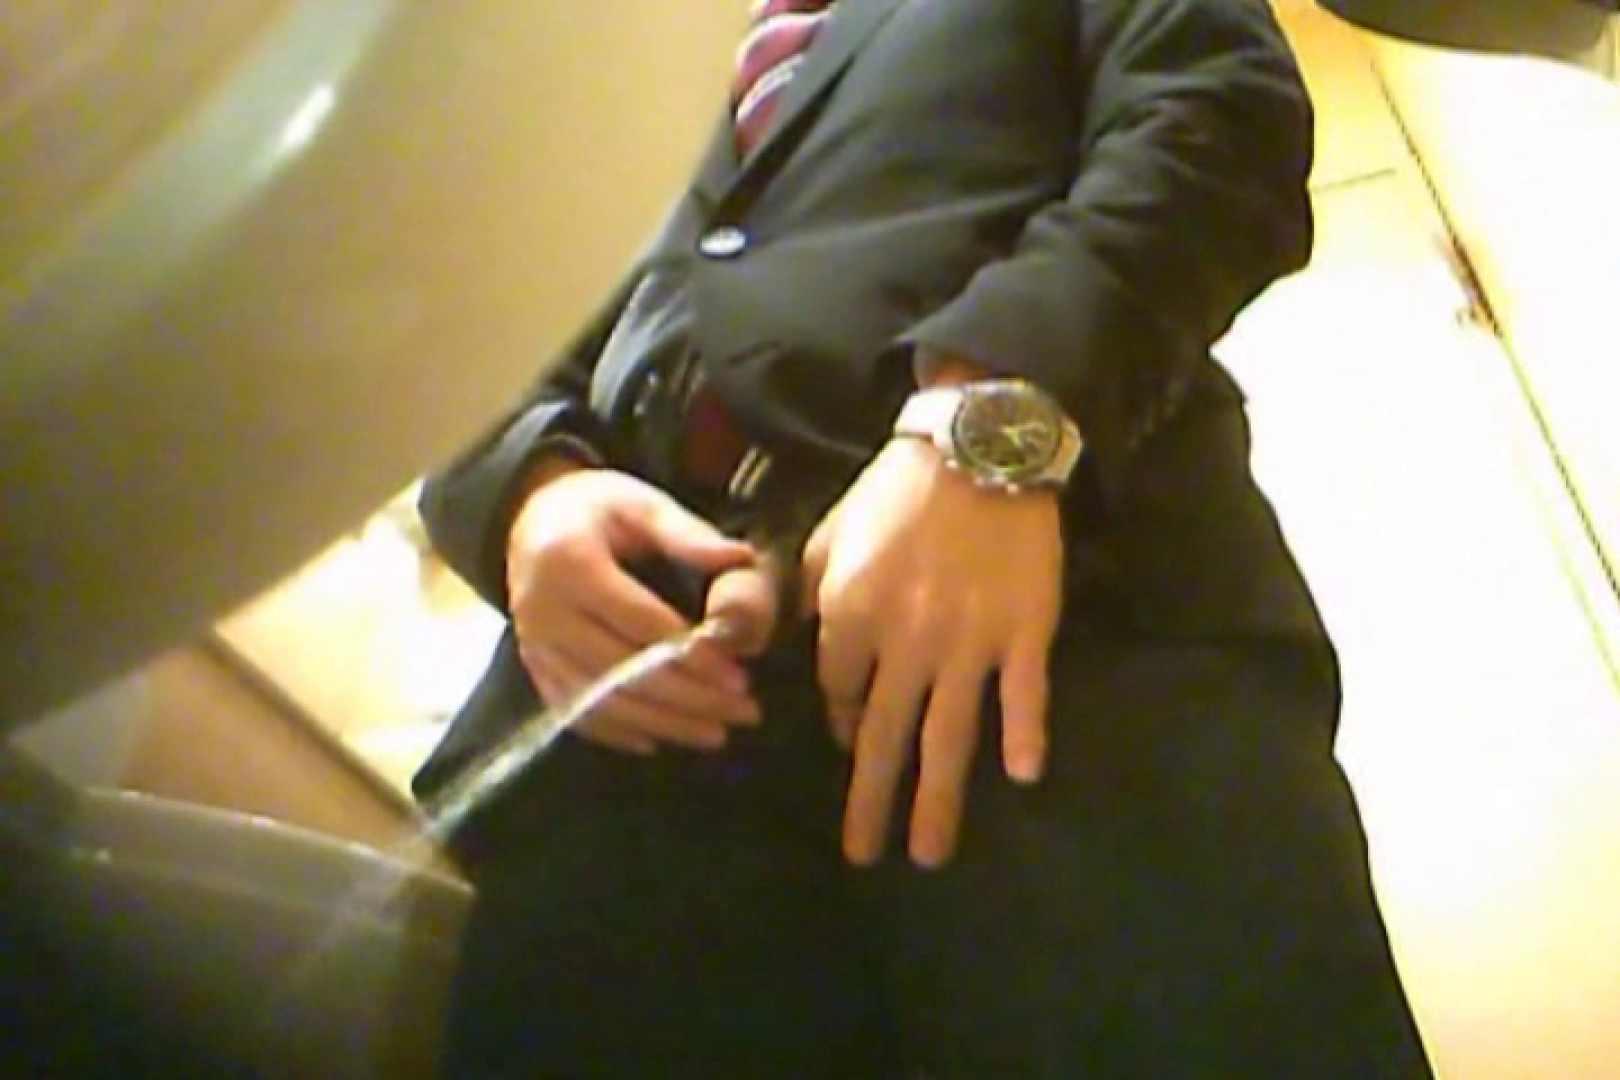 SEASON 3rd!掴み取りさんの洗面所覗き!in新幹線!VOL.21 覗きお宝 ゲイエロ動画 108連発 101